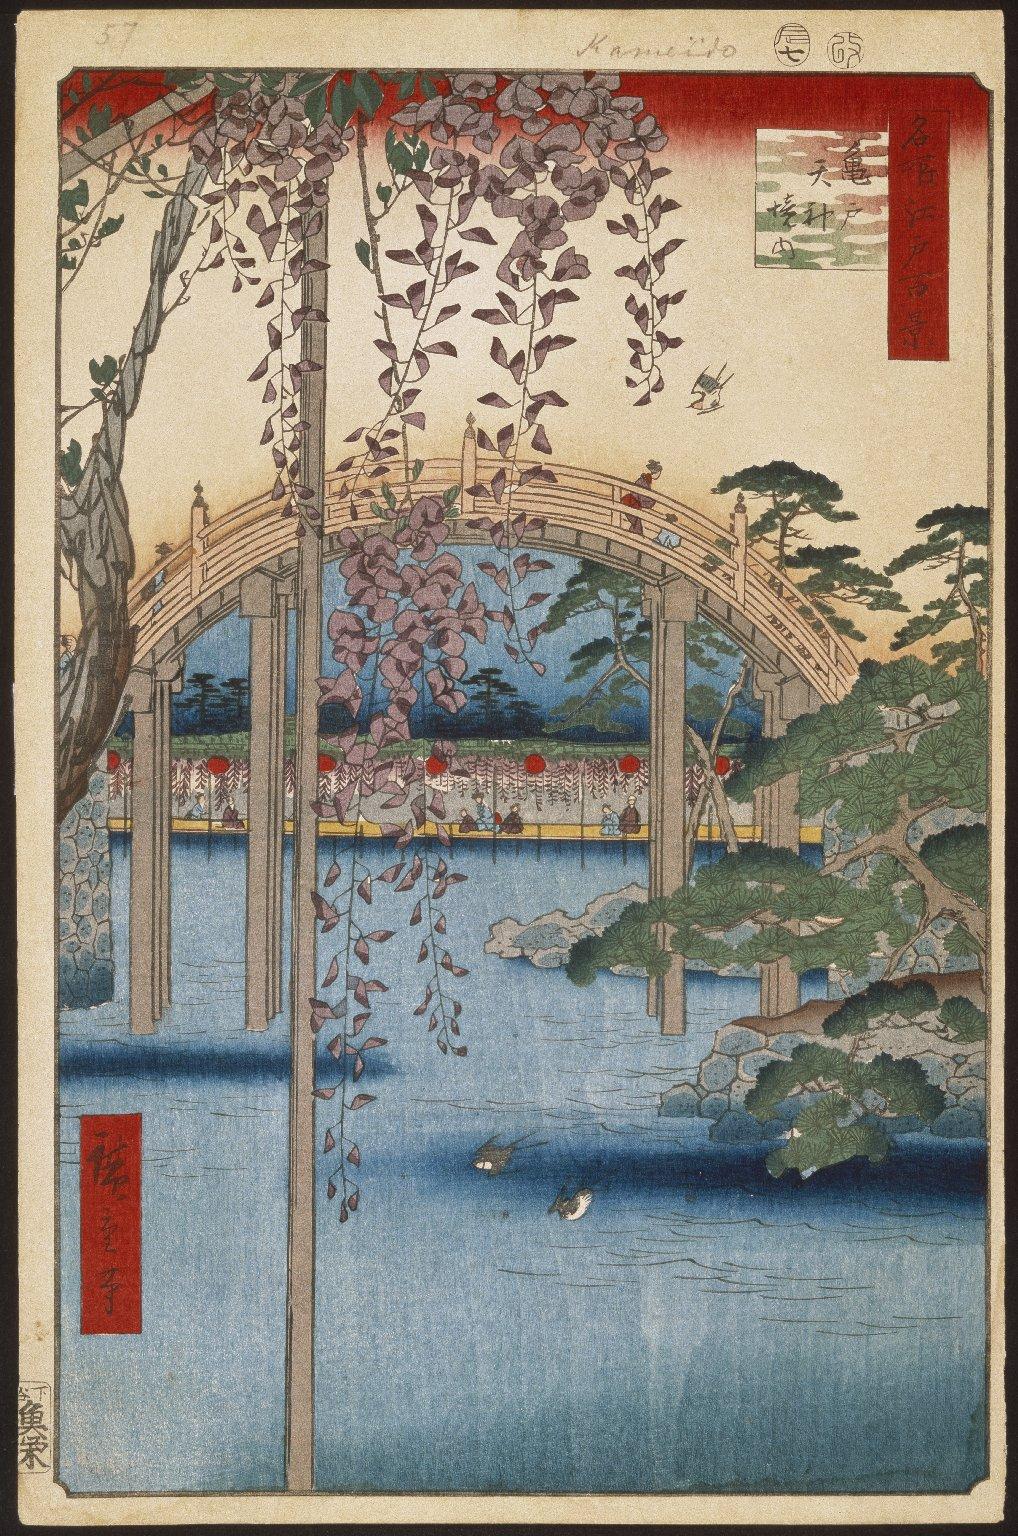 Inside Kameido Tenjin Shrine, No. 65 from One Hundred Famous Views of Edo, Woodblock Print by Utagawa Hiroshige (1797-1858). Brooklyn Museum, gift of Anna Ferris.